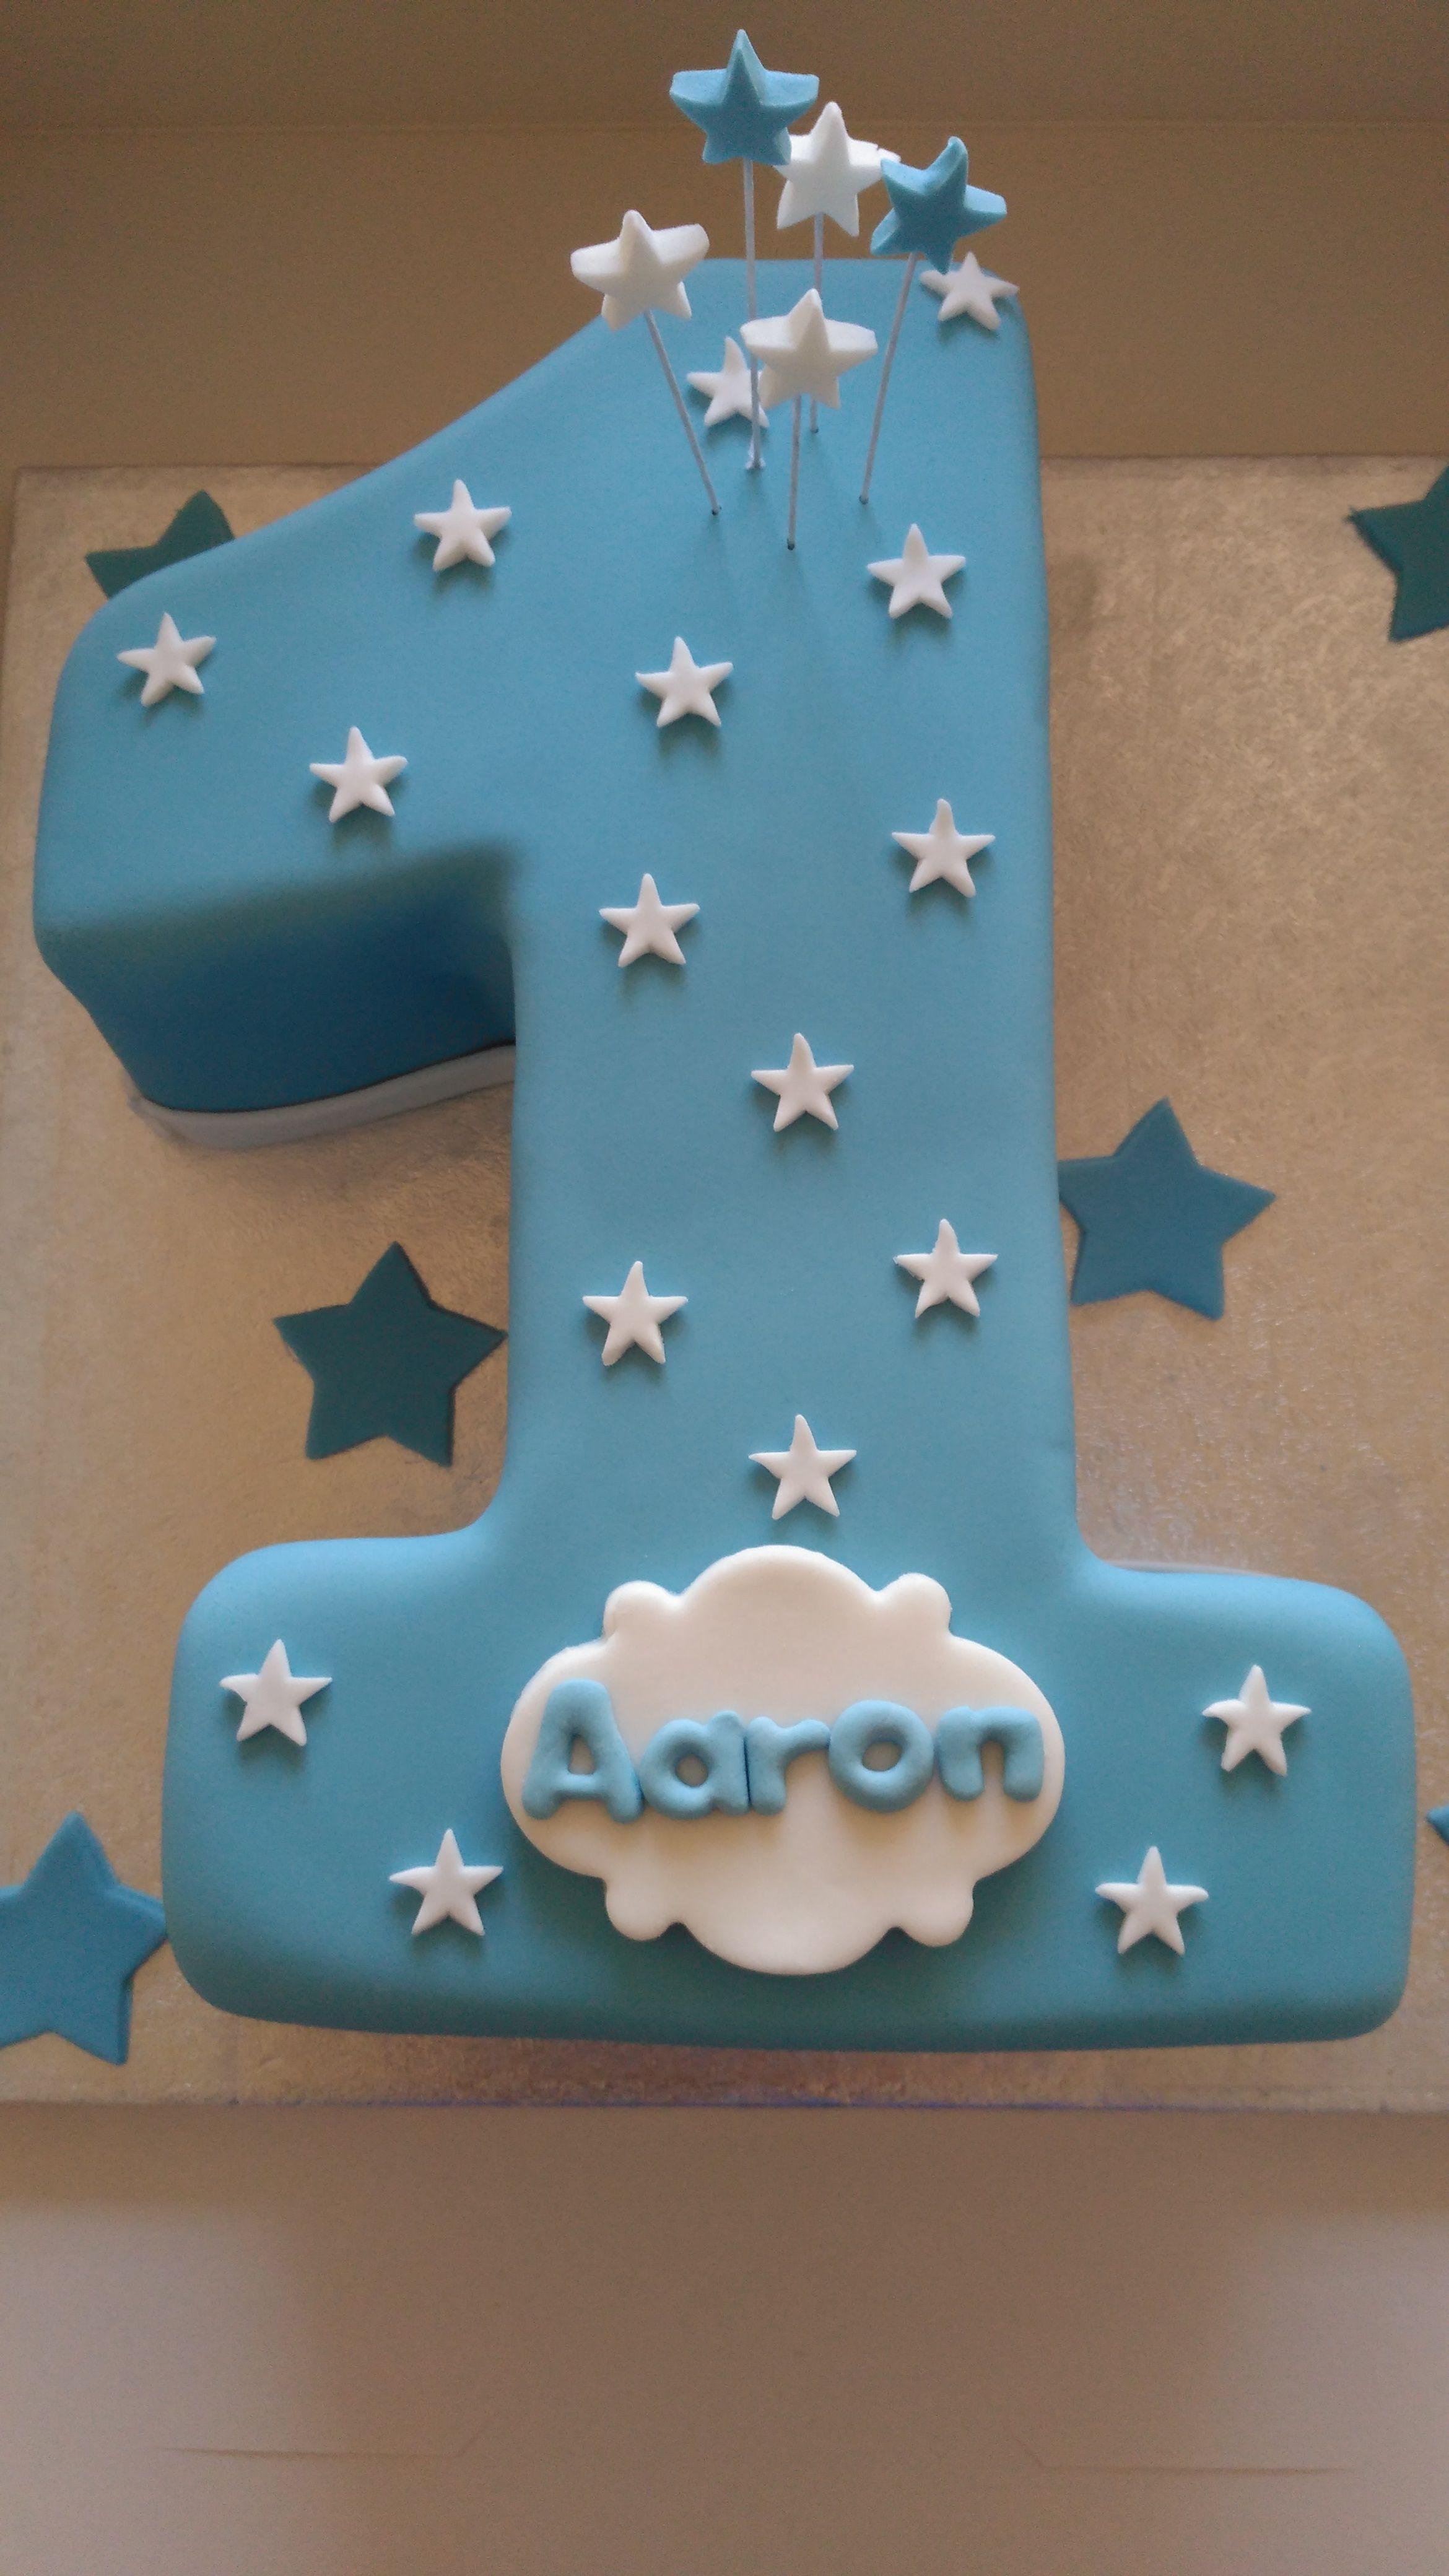 Outstanding 32 Brilliant Picture Of Birthday Cakes For Boys Birijus Com Funny Birthday Cards Online Inifodamsfinfo